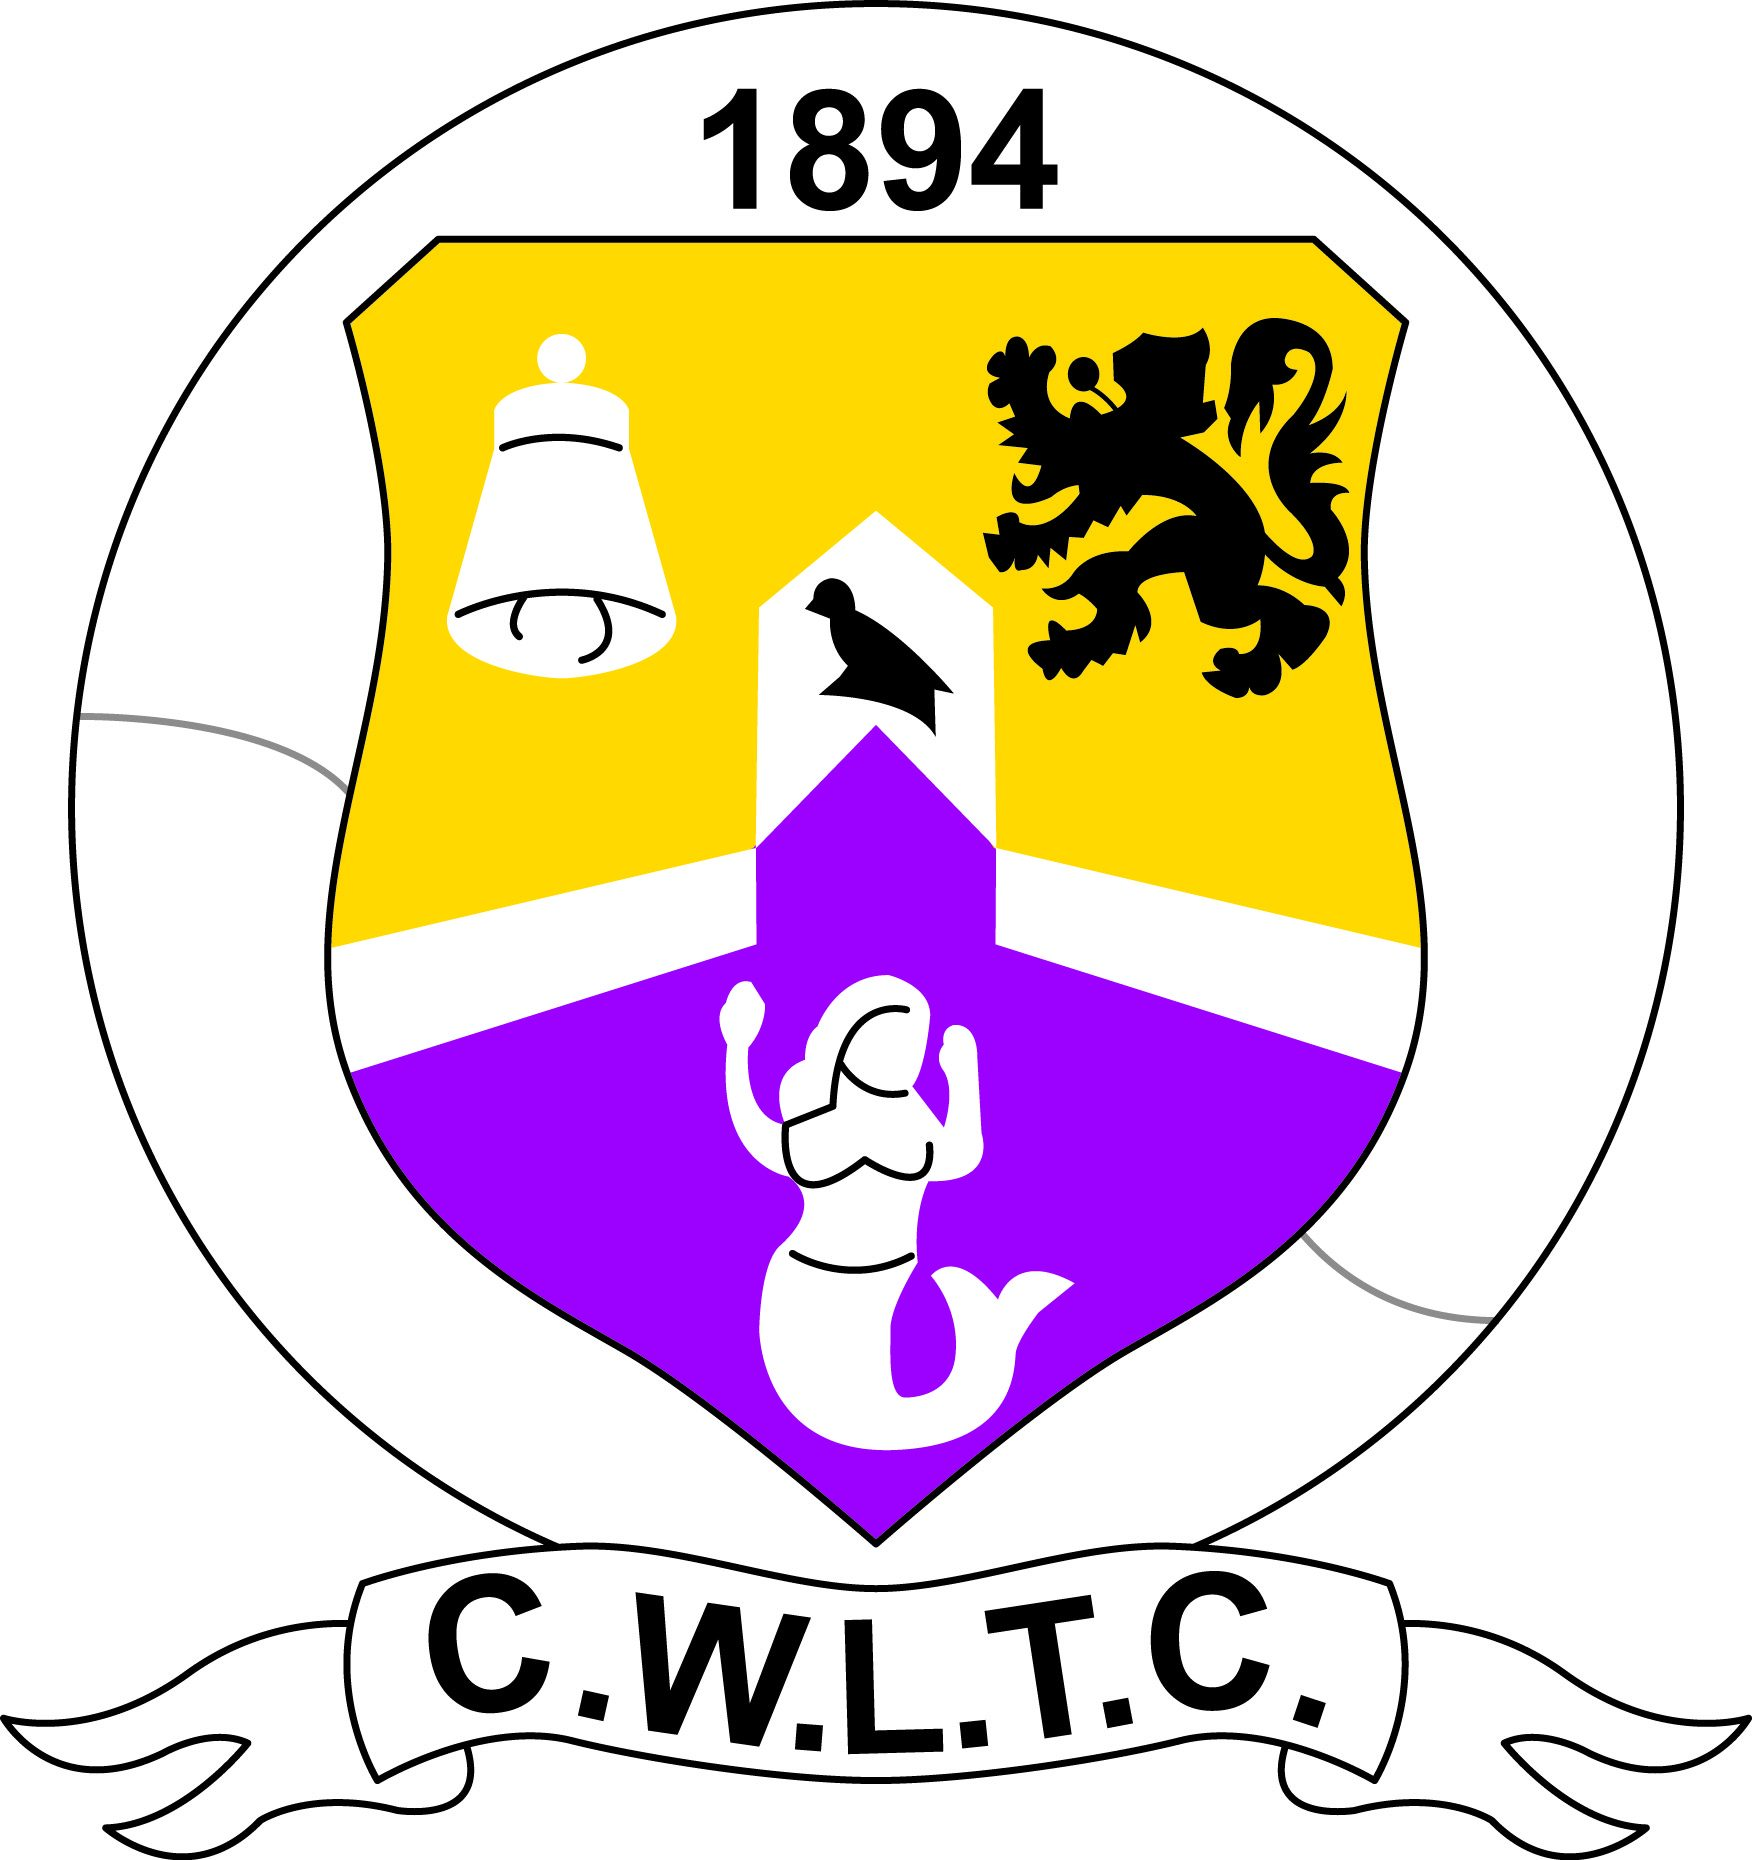 County Wicklow LTC